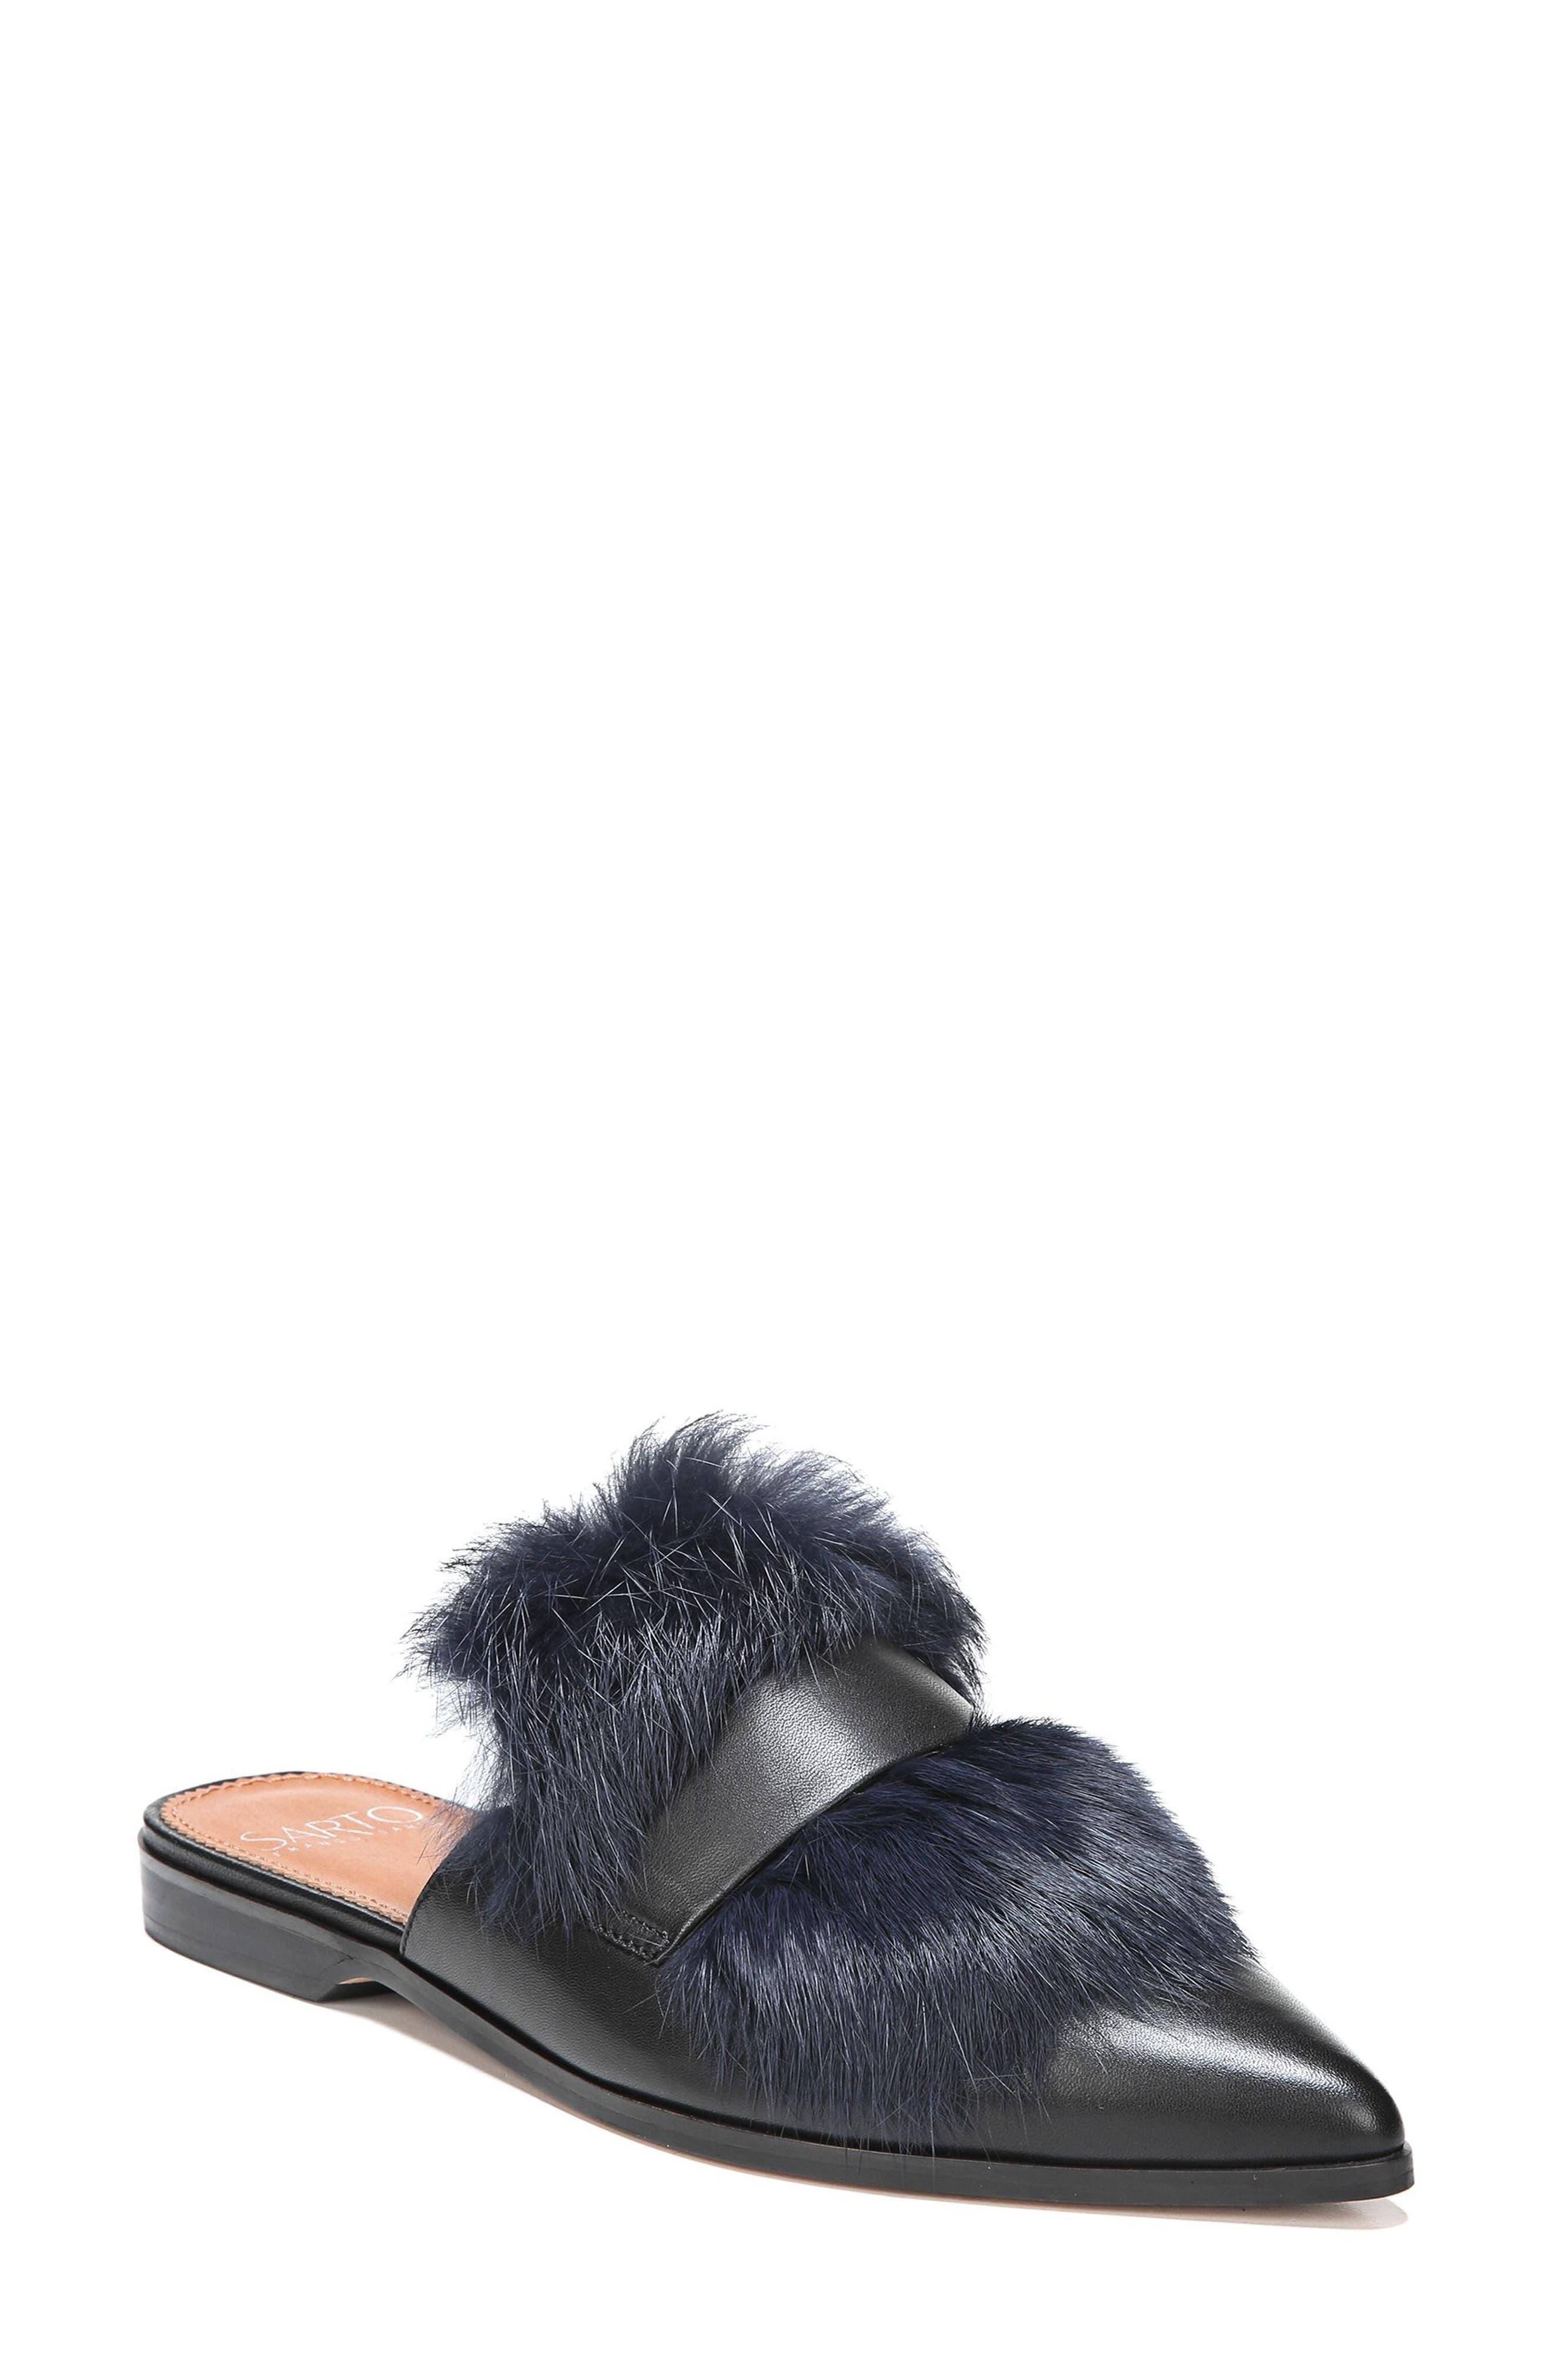 Palmer II Genuine Rabbit Fur Slide,                         Main,                         color, 001